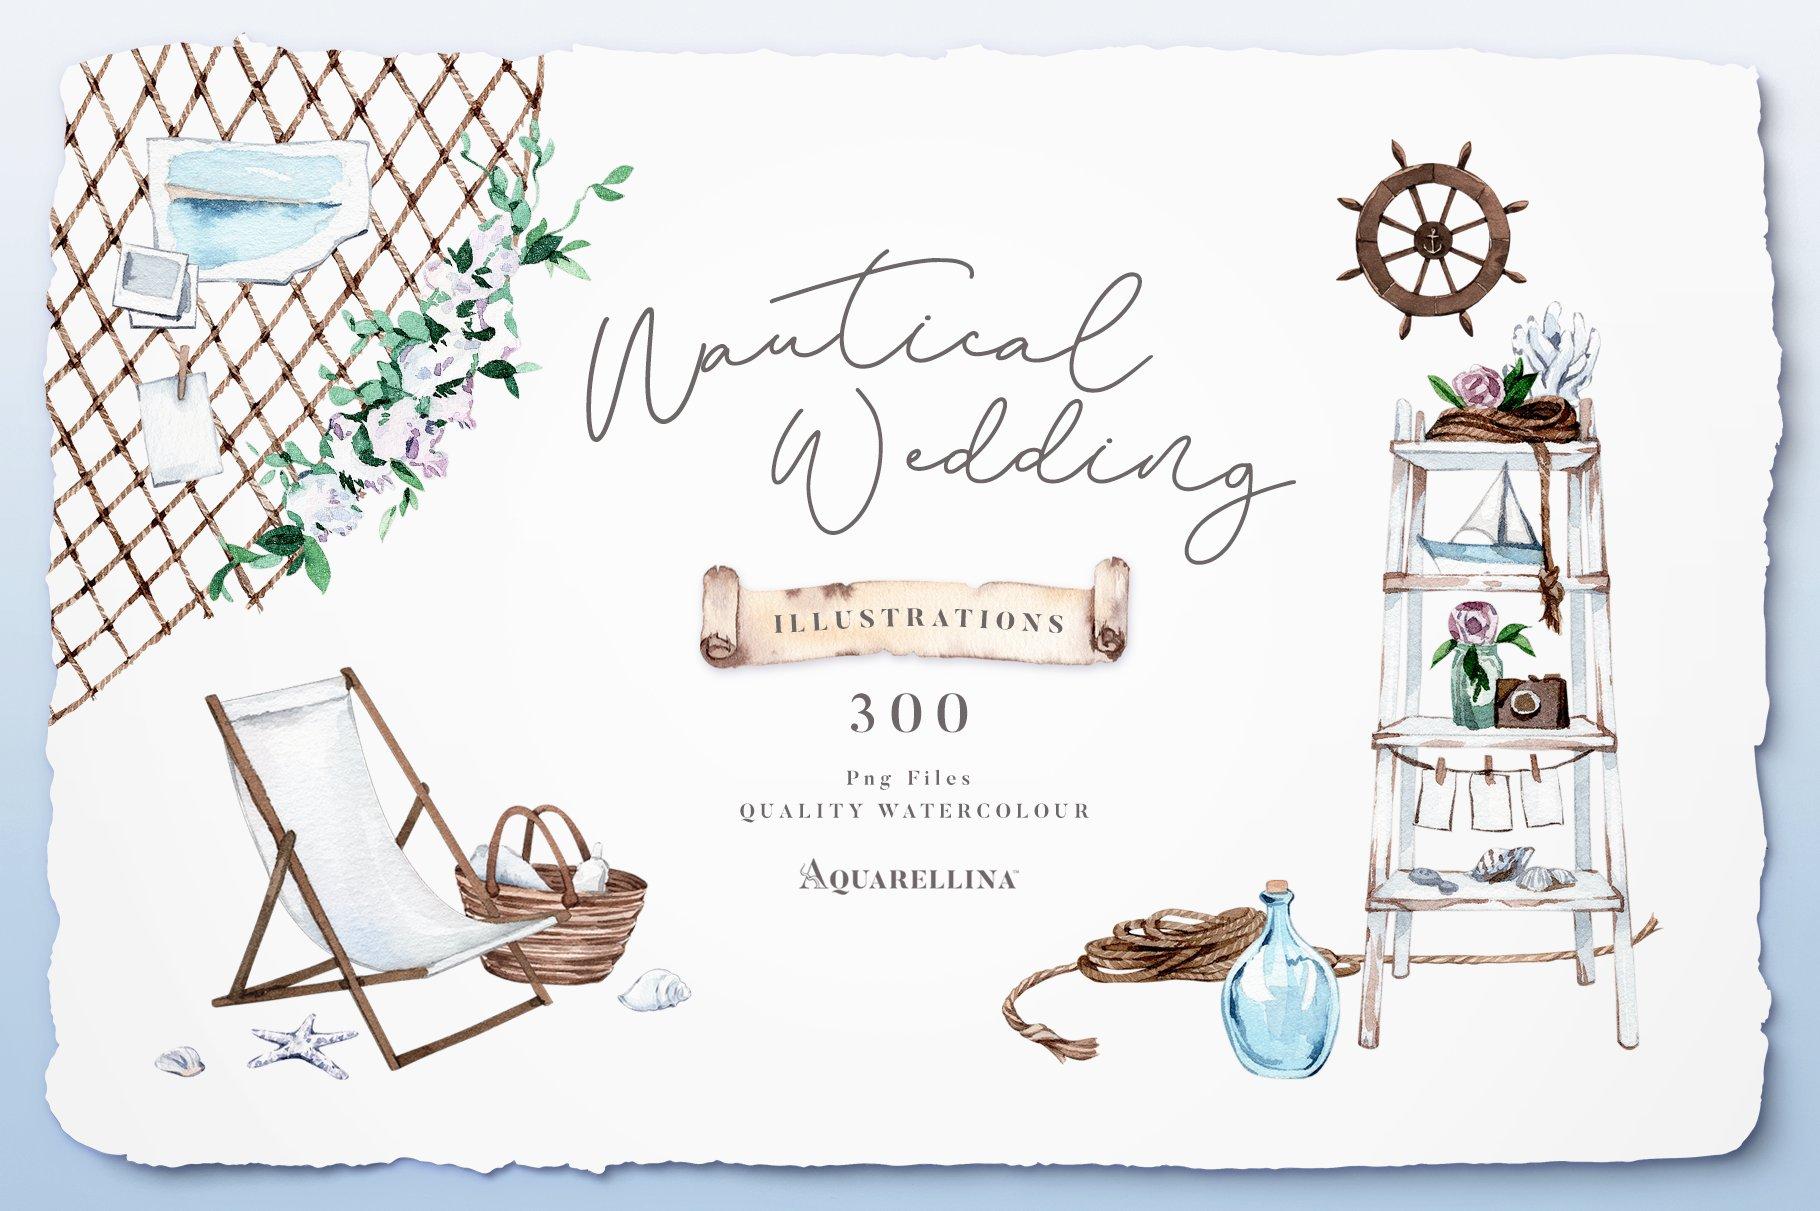 nautical beach wedding illustrations by aquarellina cover 2